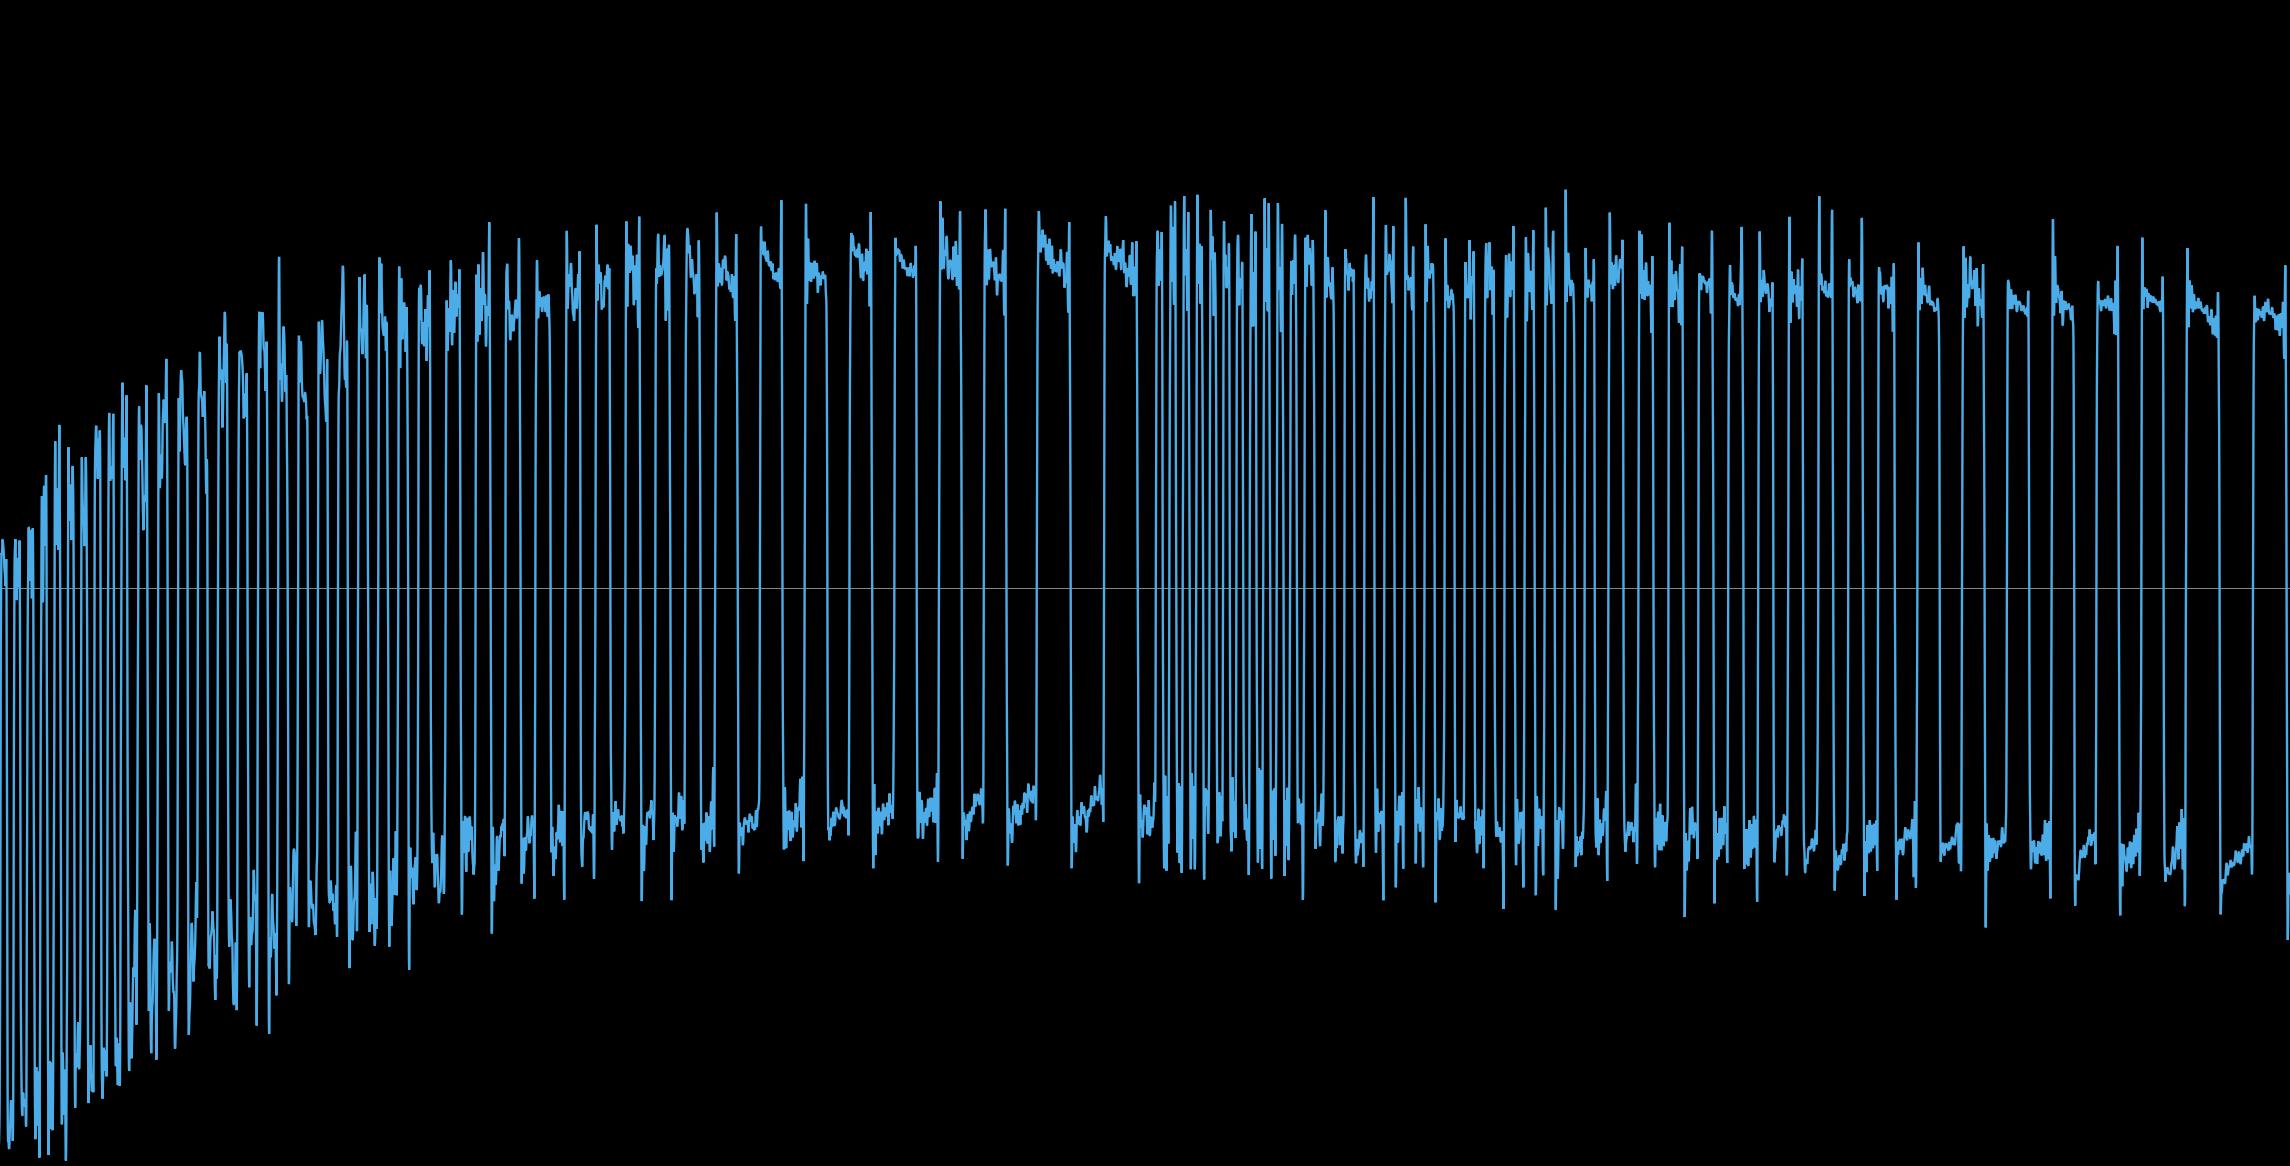 Super Mario Sound Effects Reproduction | PURE DATA forum~